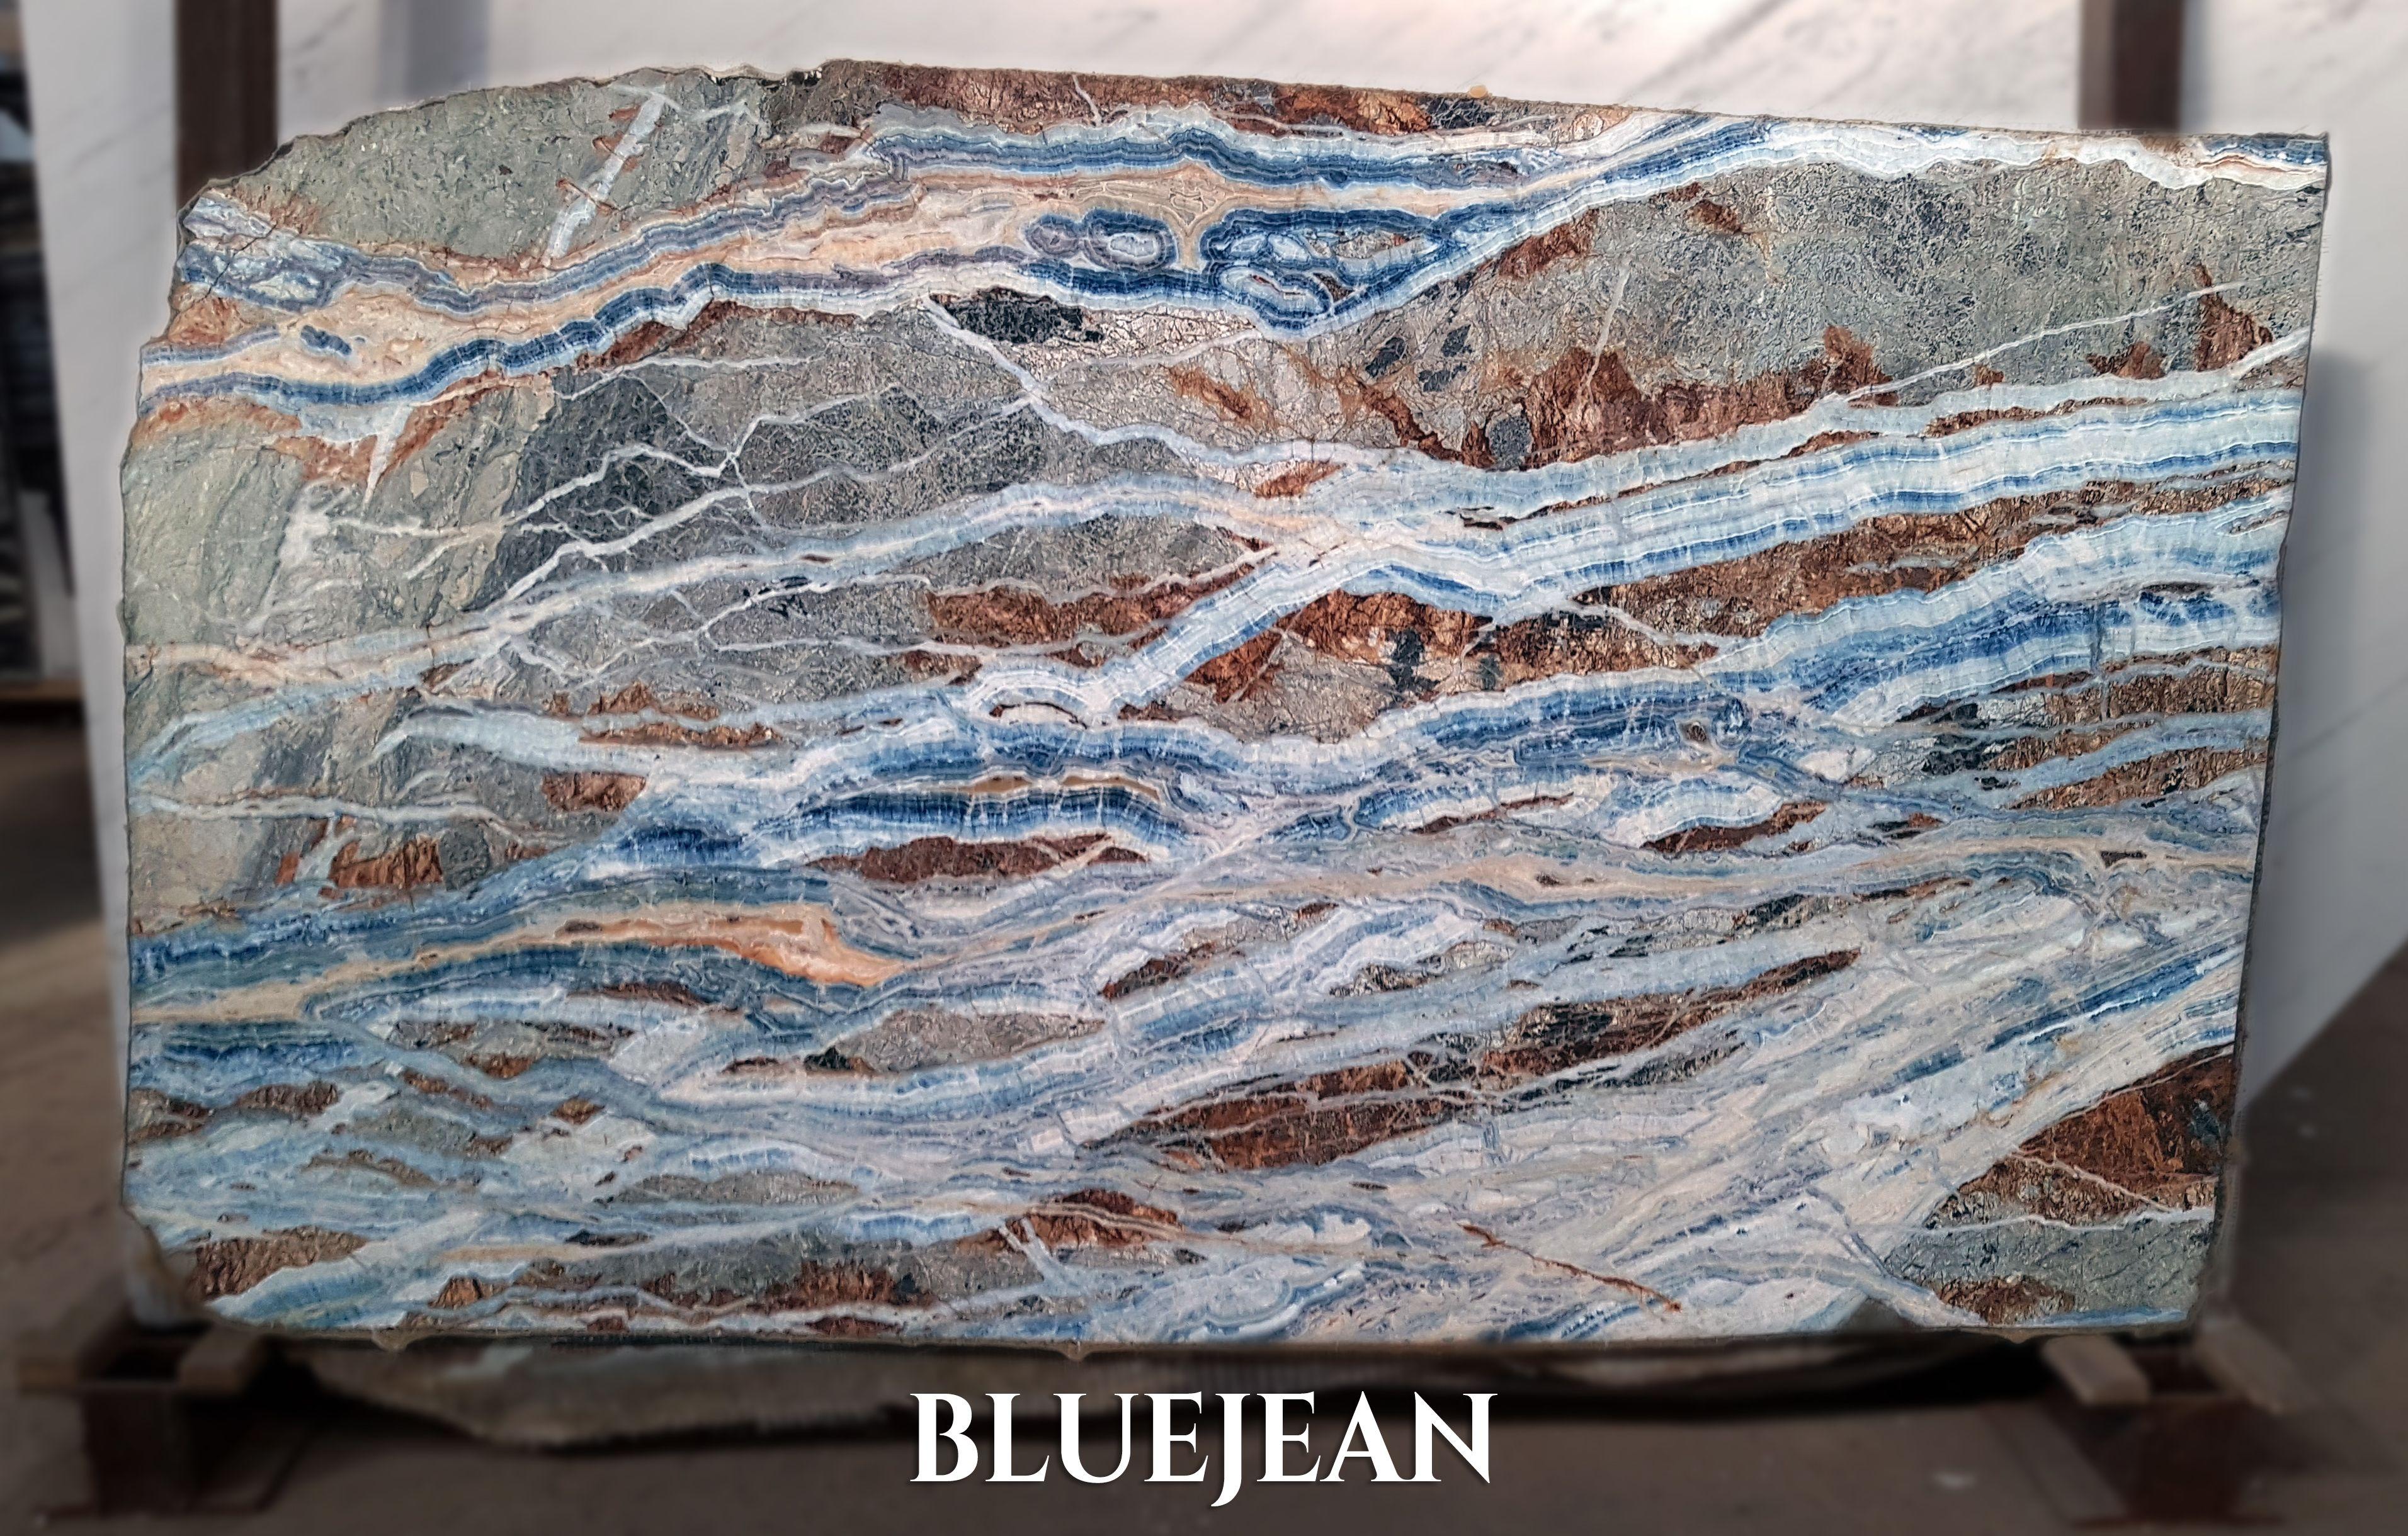 Bluejean Classic Bluejean Marble Bluemarble Slabs Marmi Bluejeans Blue Stone Design Bluejeanmarble Bluejeansmarble Bluej Stone Slab Stone Marble